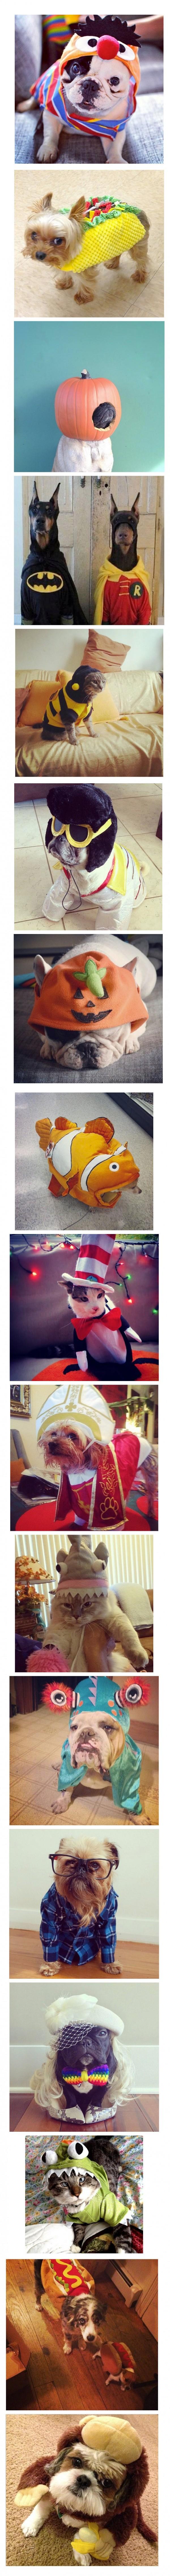 Mascotas listas para Halloween